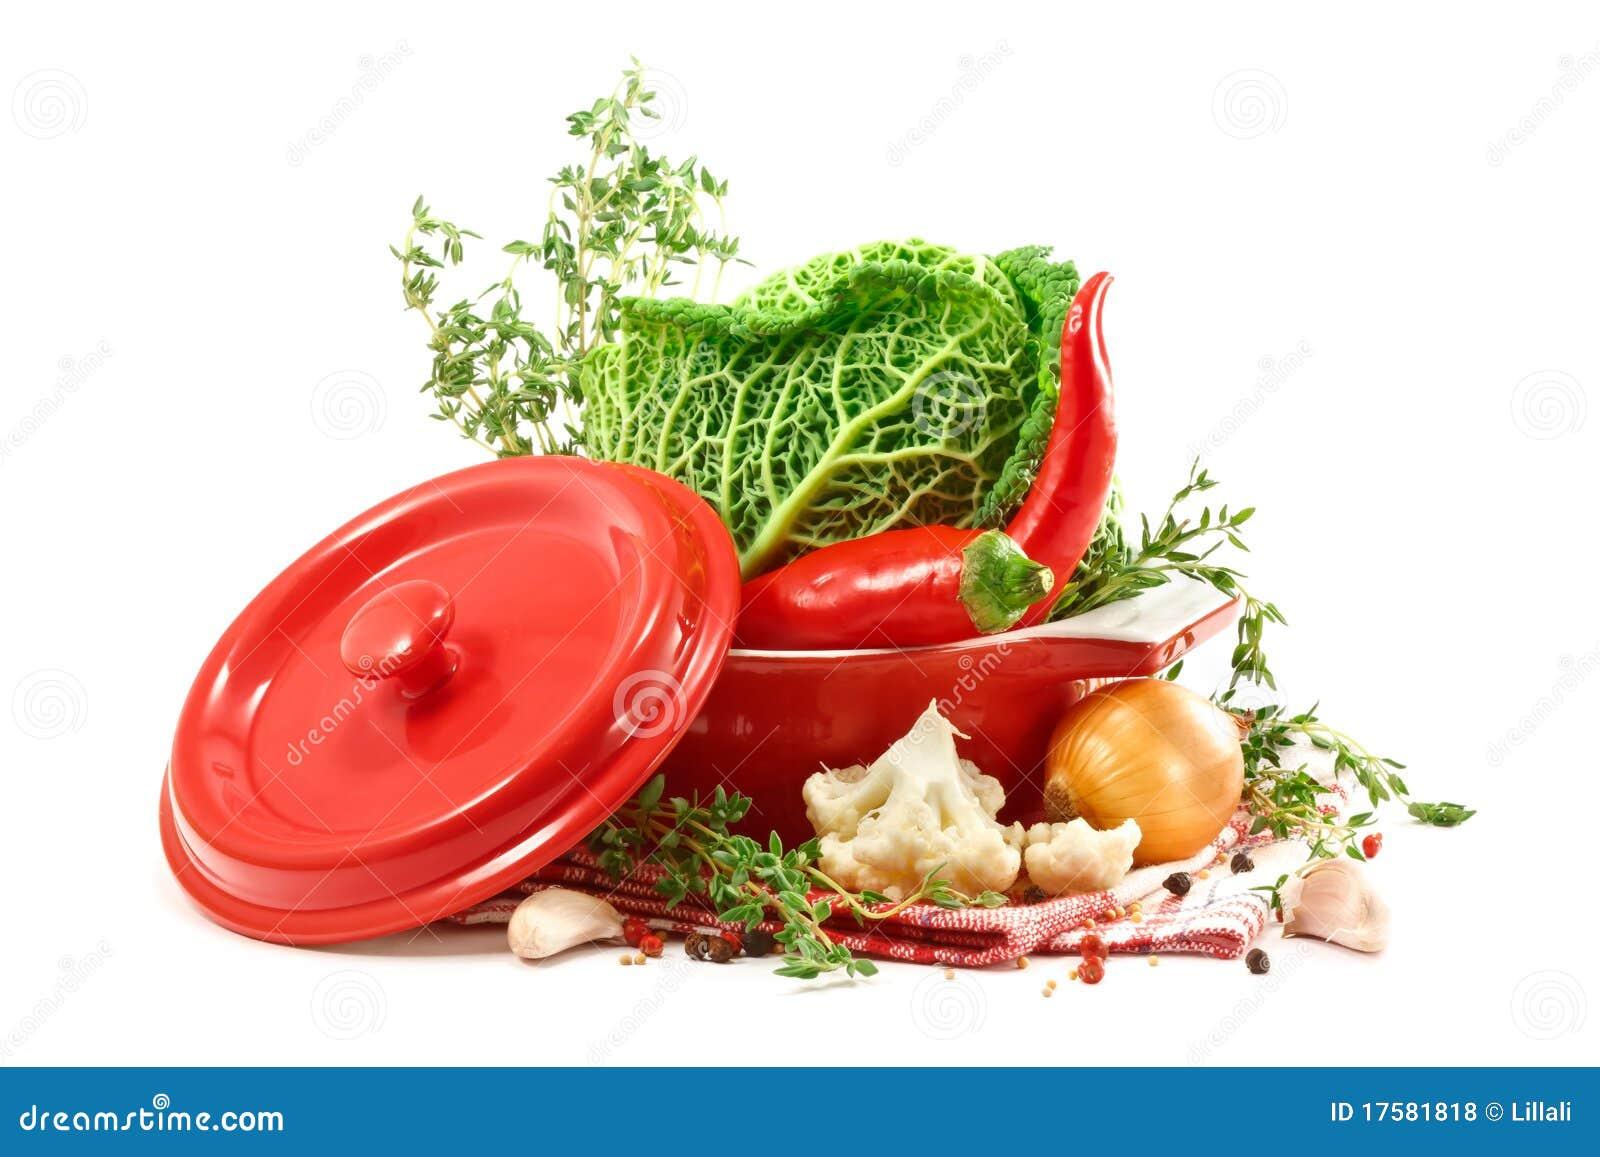 Beautiful vegetables royalty free stock photos image for Beautiful vegetables